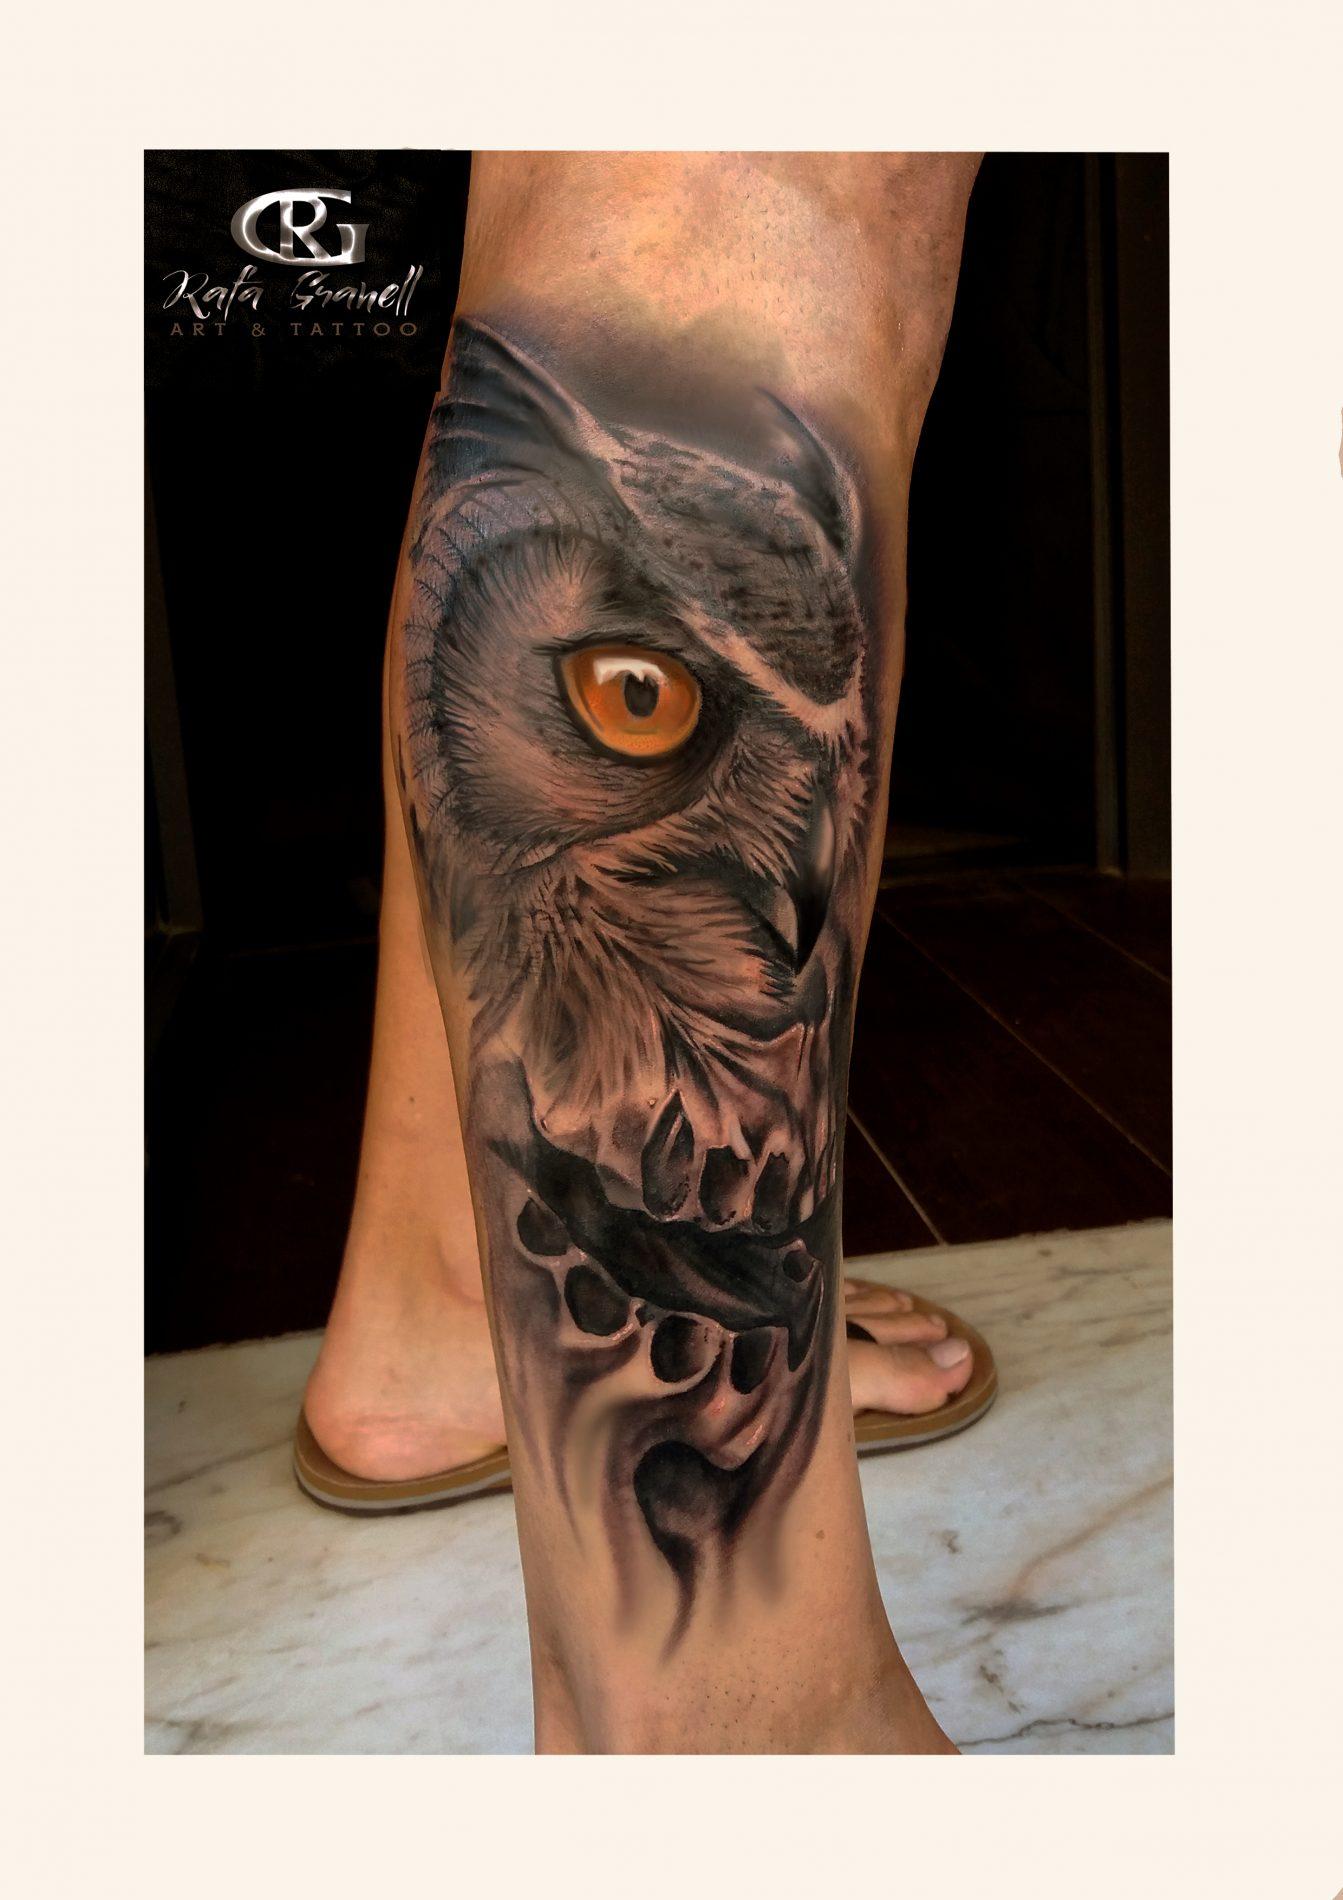 buho#calavera#realista#realismo#tatuajes#realistas#tattoo#blanco y negro#tatuador#valenciano#tatuadores#españoles#valencia#rgtattoo#rafa#granell#la torre#